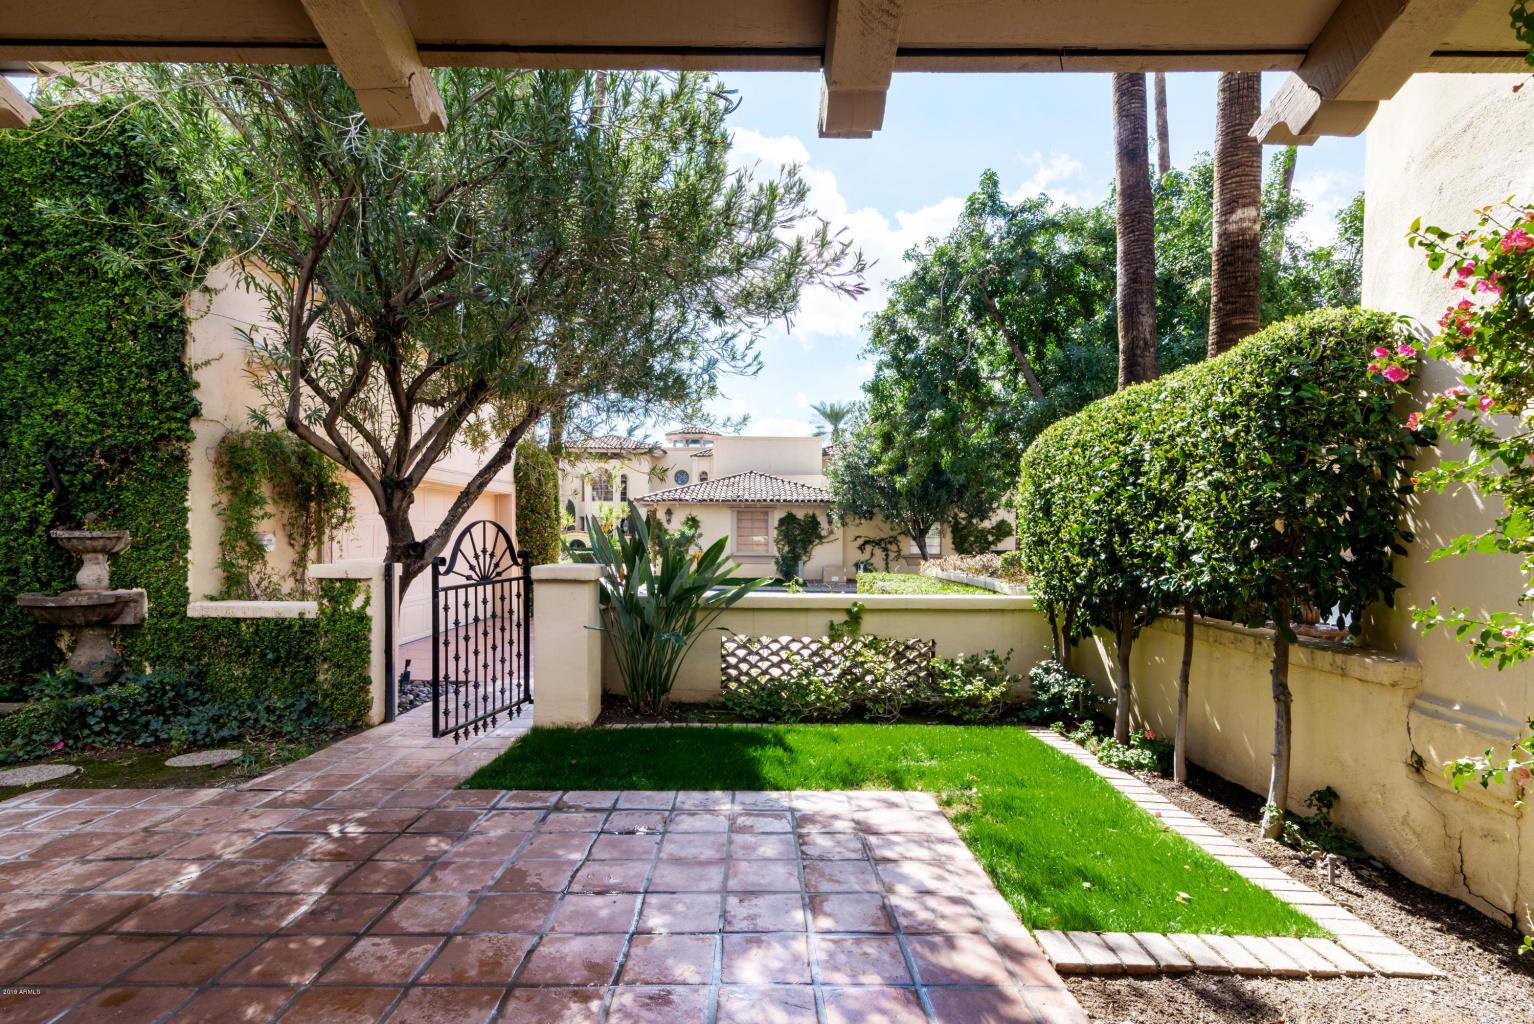 7500 E McCormick Pkwy 65, Scottsdale | $671,453